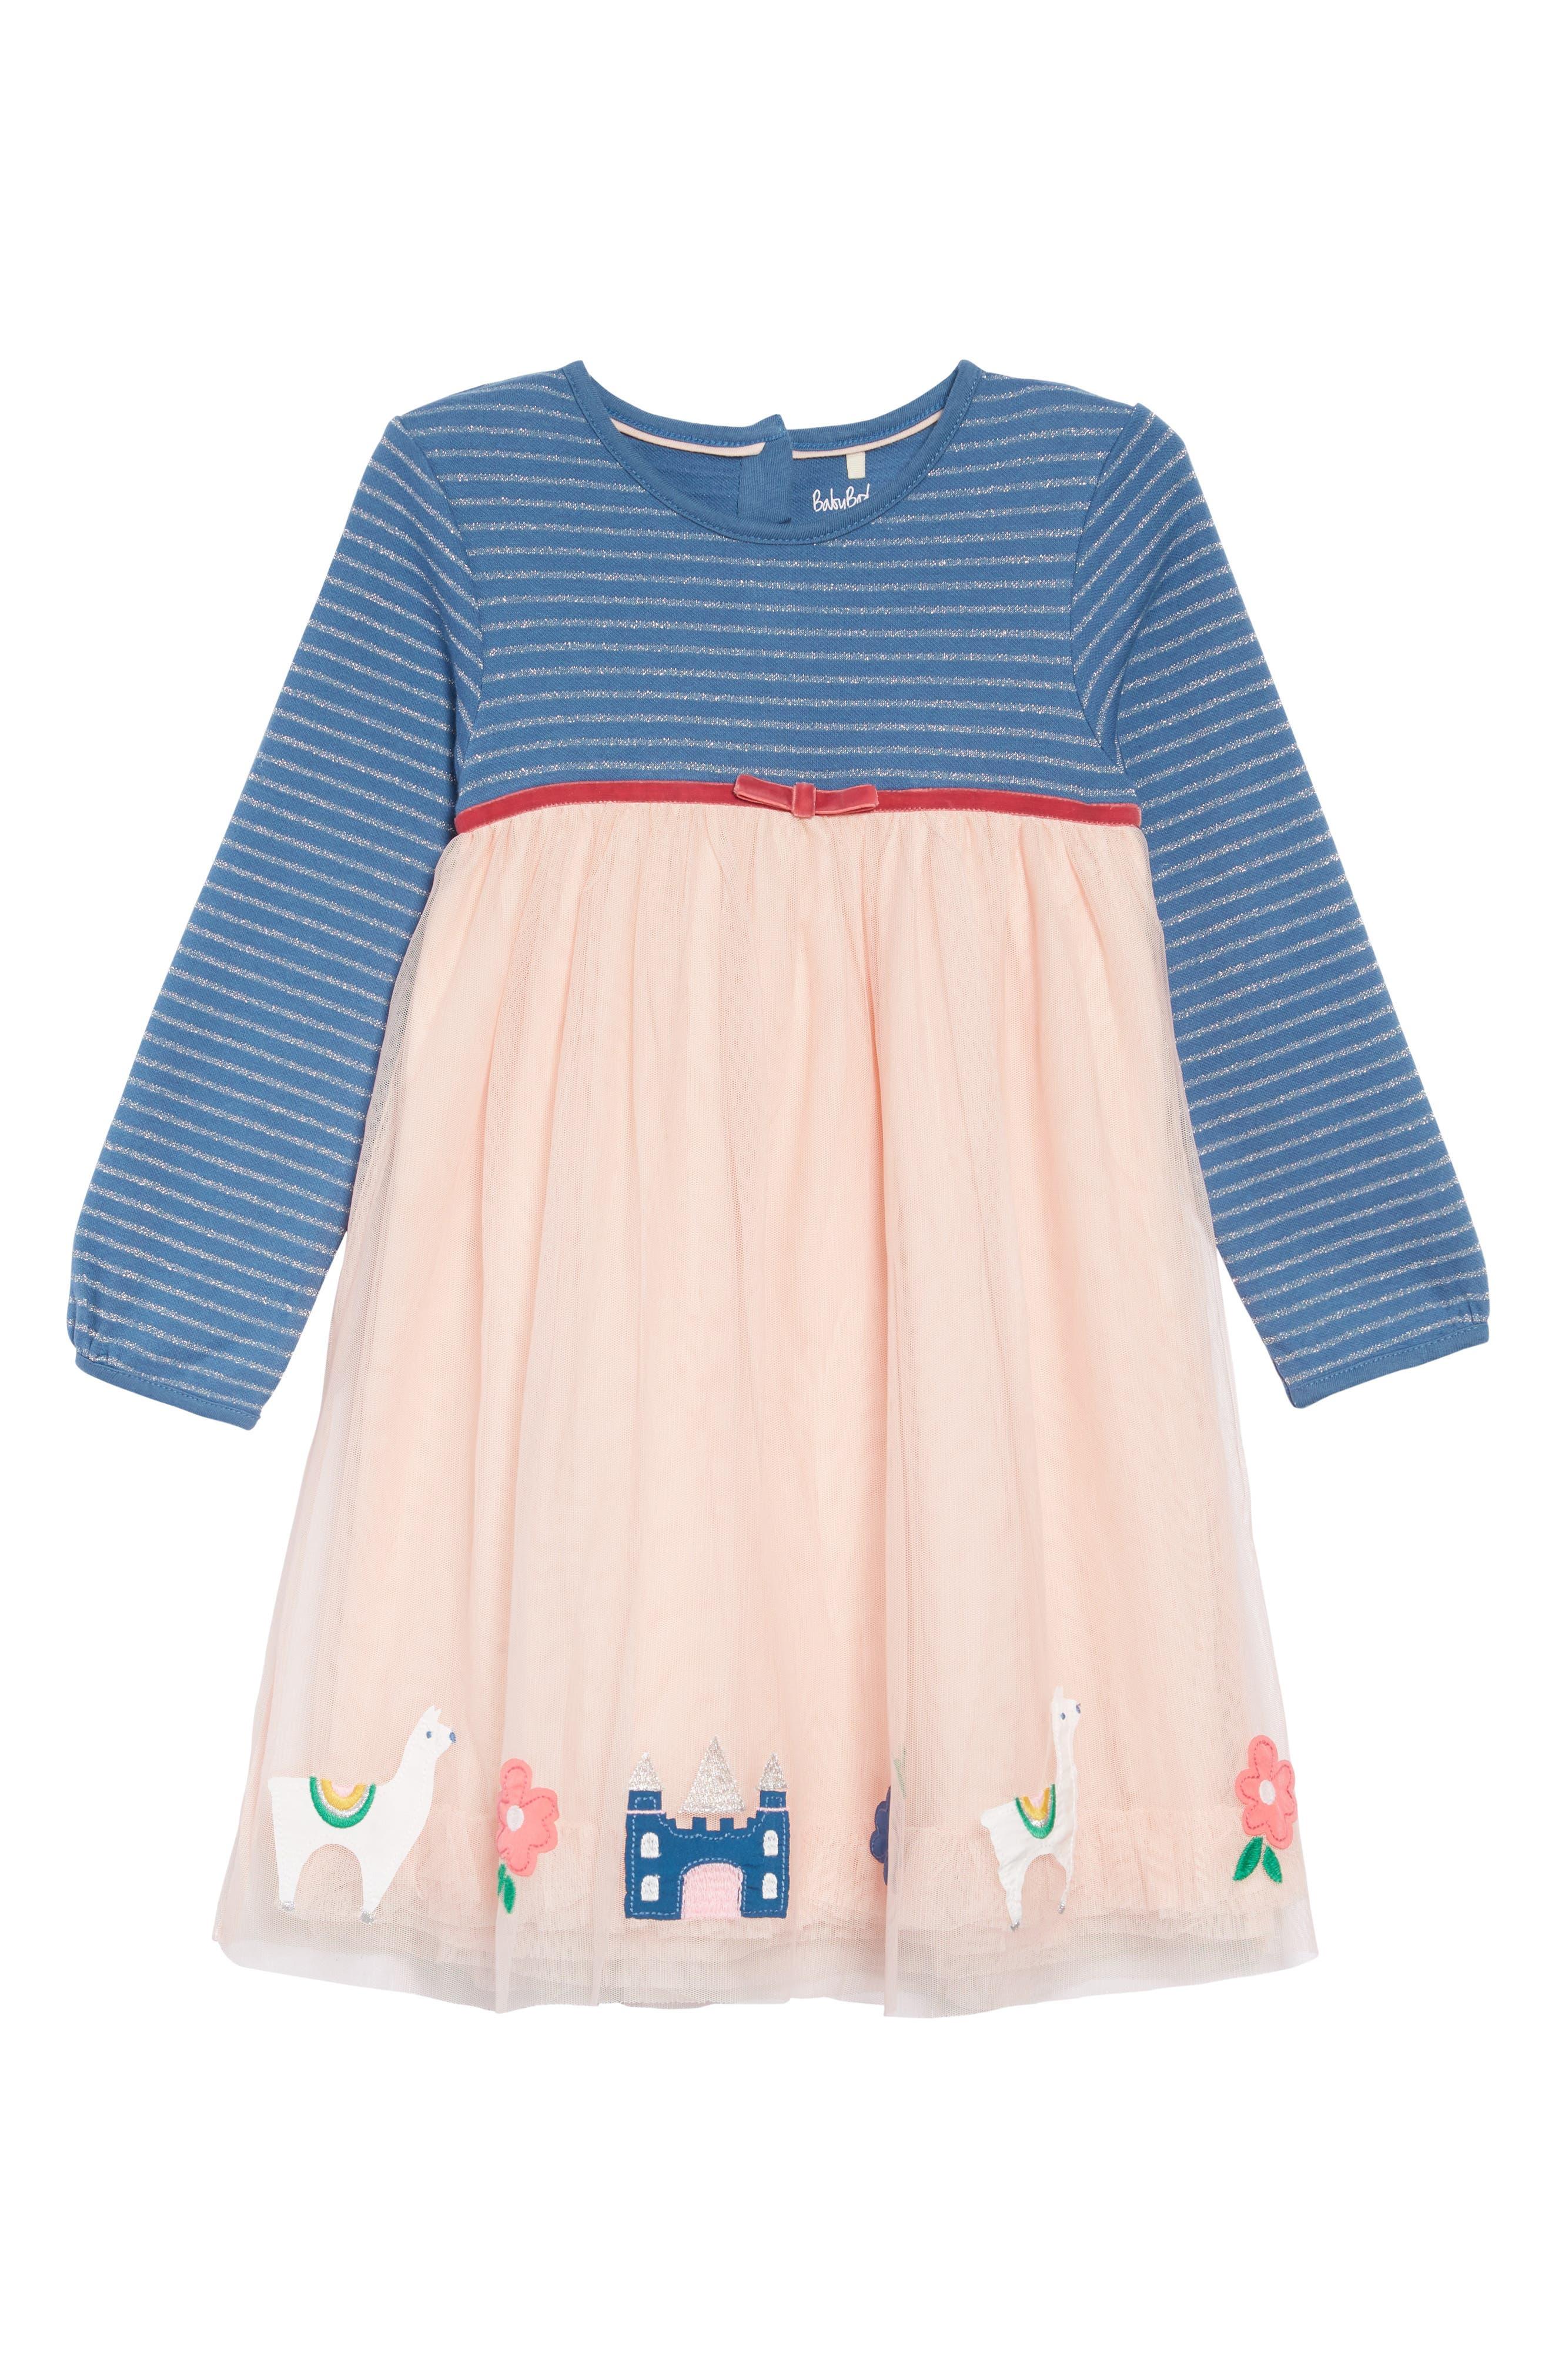 Magical Tulle Dress,                             Main thumbnail 1, color,                             PNK PROVENCE DUSTY PINK LLAMA